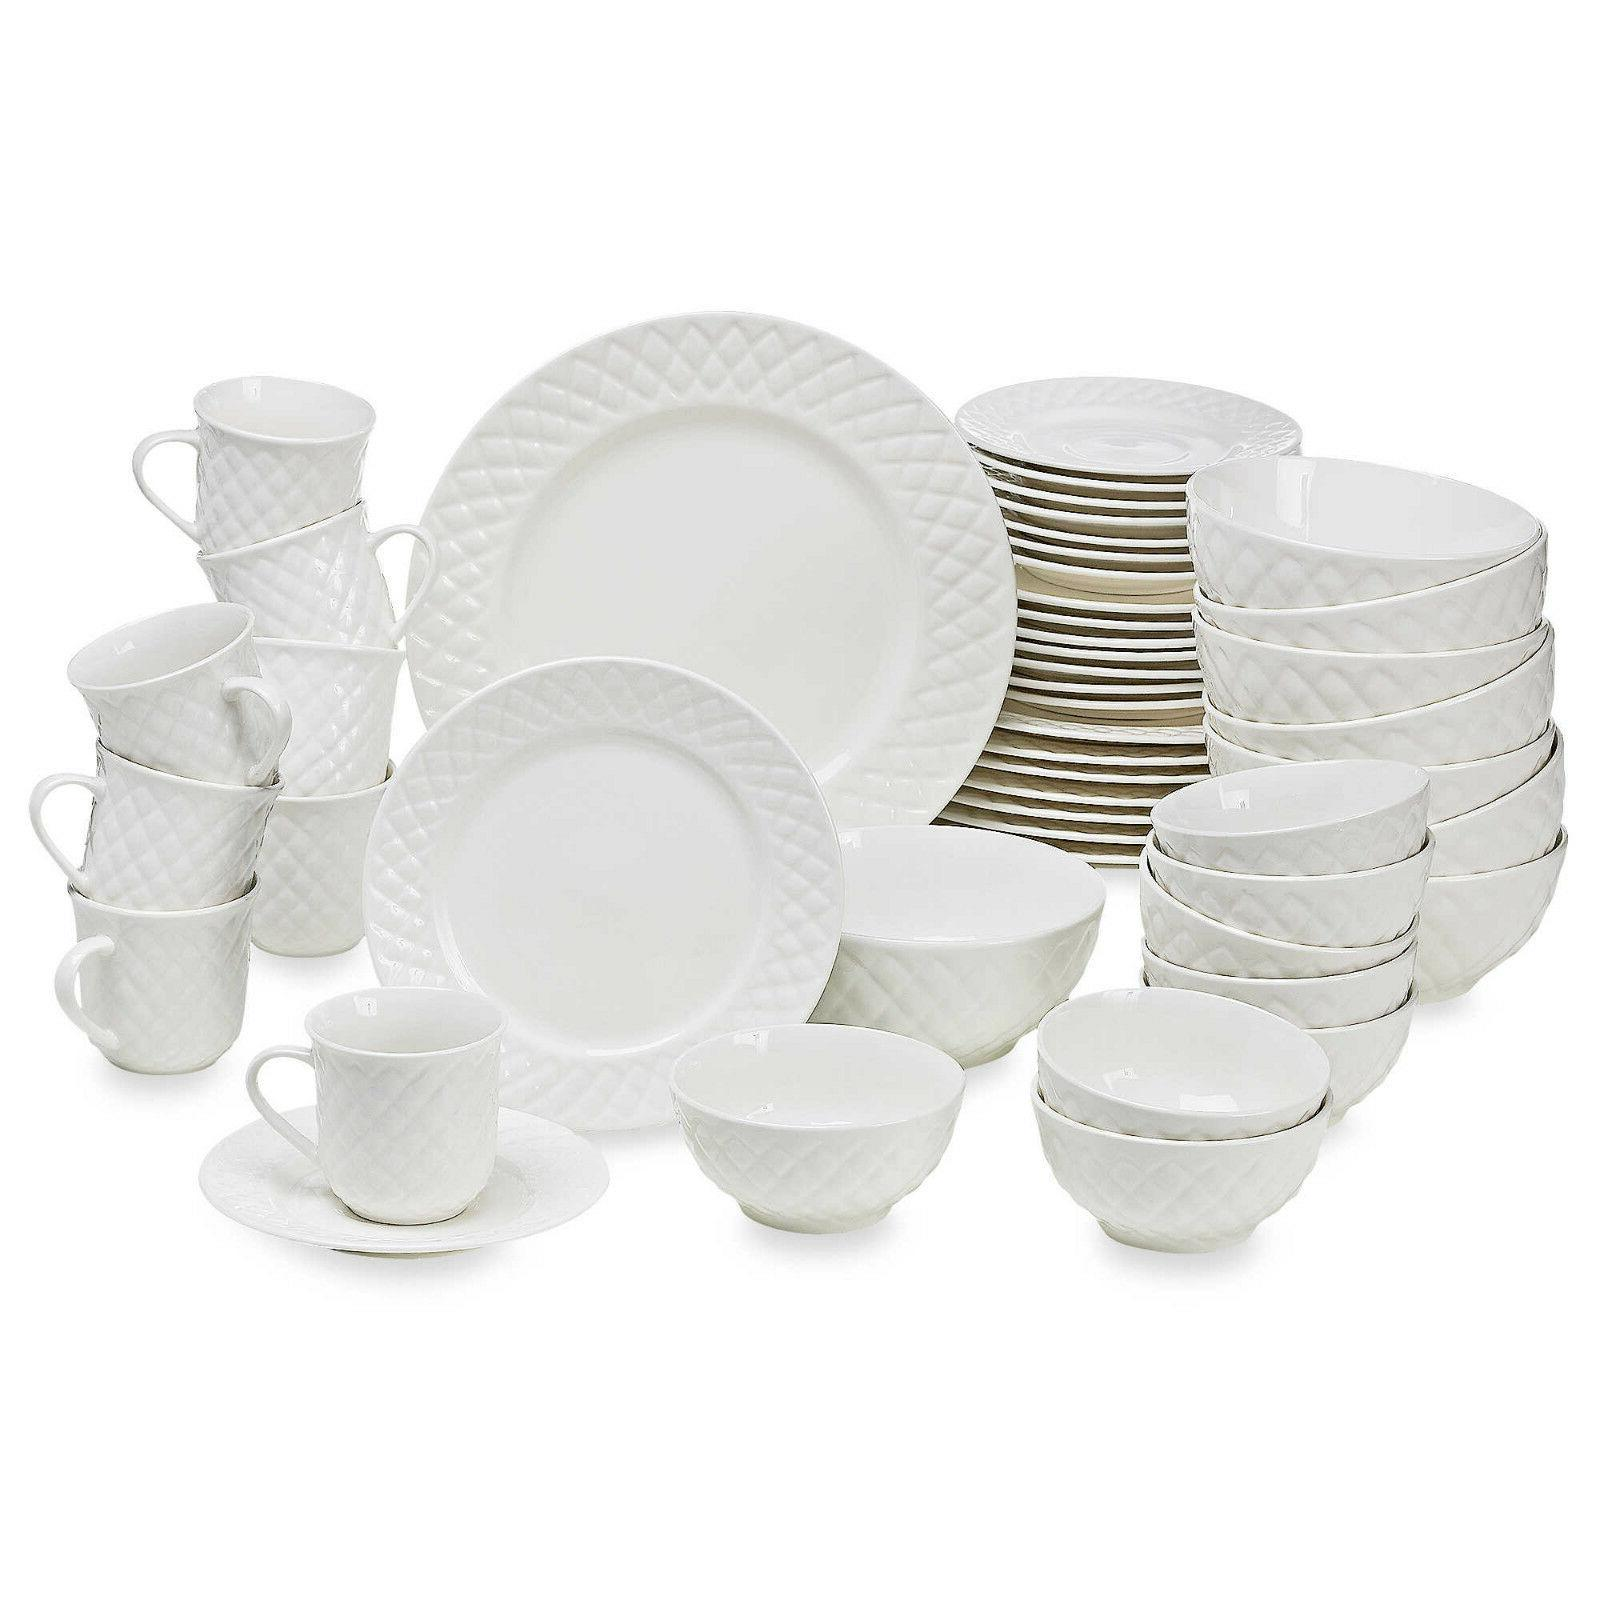 Antique Quilt 48-Piece Dinnerware Set - Porcelain, Served 8,